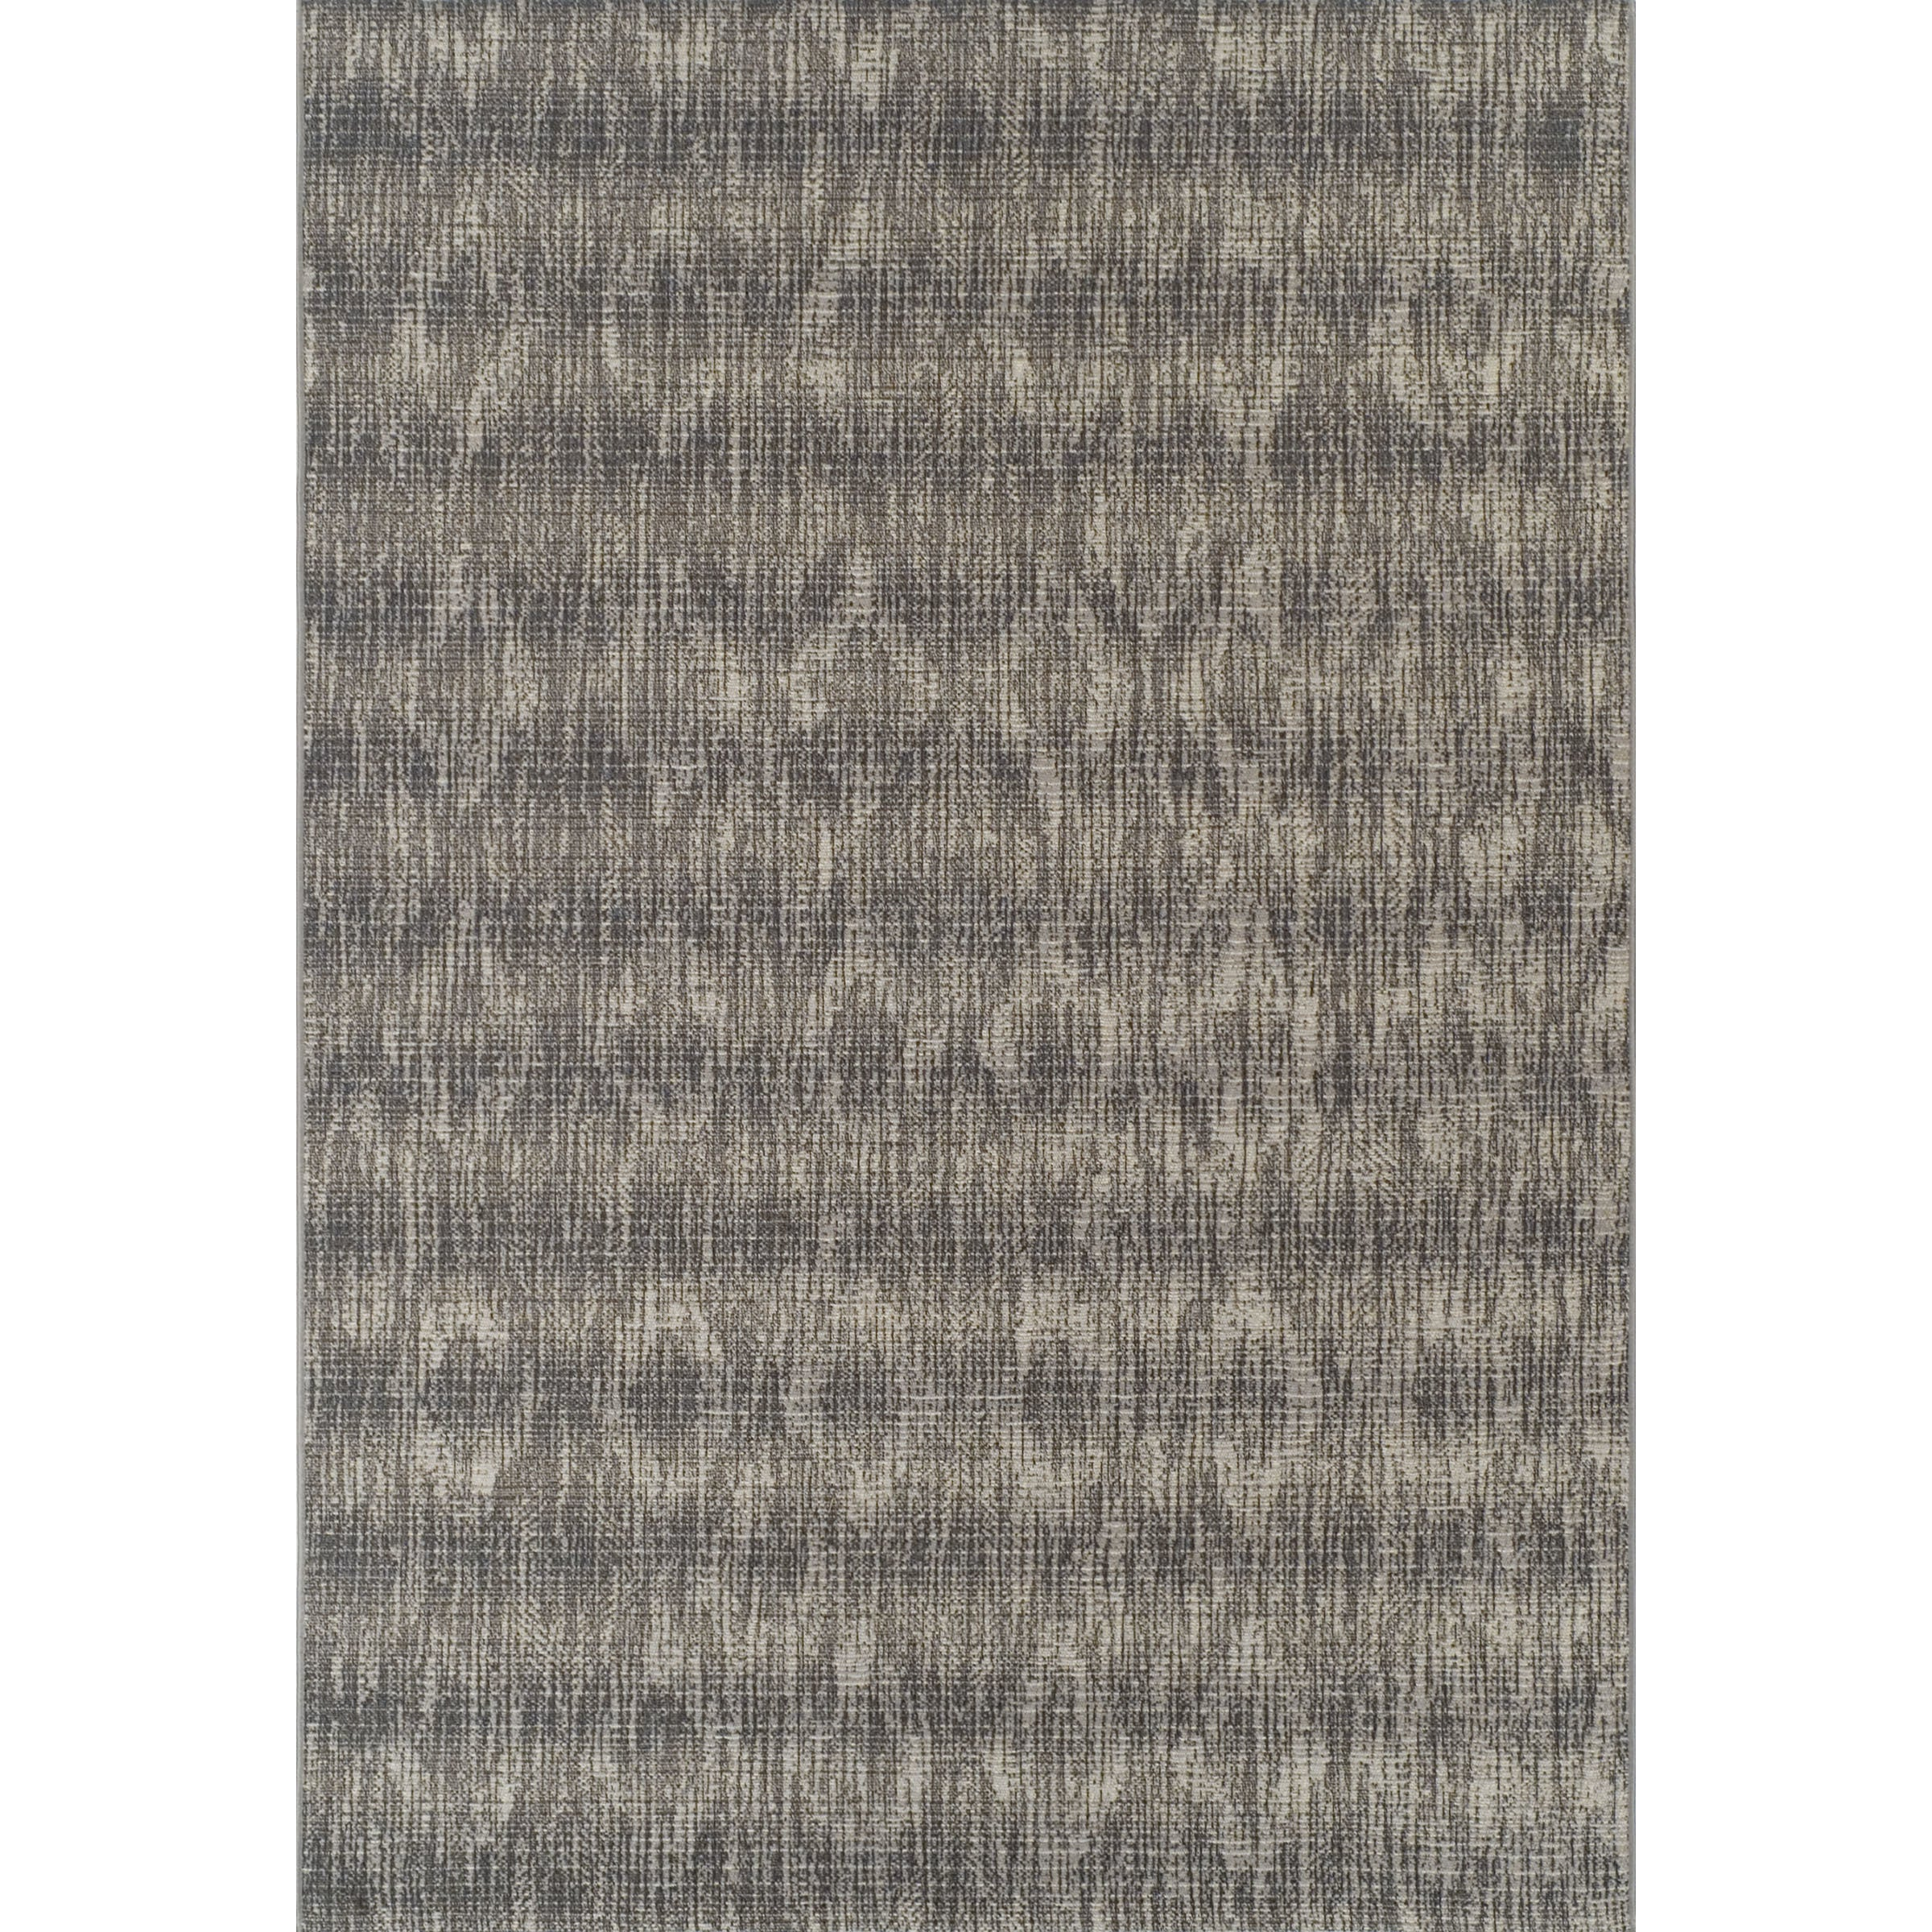 ADDISON Freeport Abstract Diamond Gray/Ivory Indoor-Outdoor Area Rug (33X51) - 33X51 (33X51 - grey)